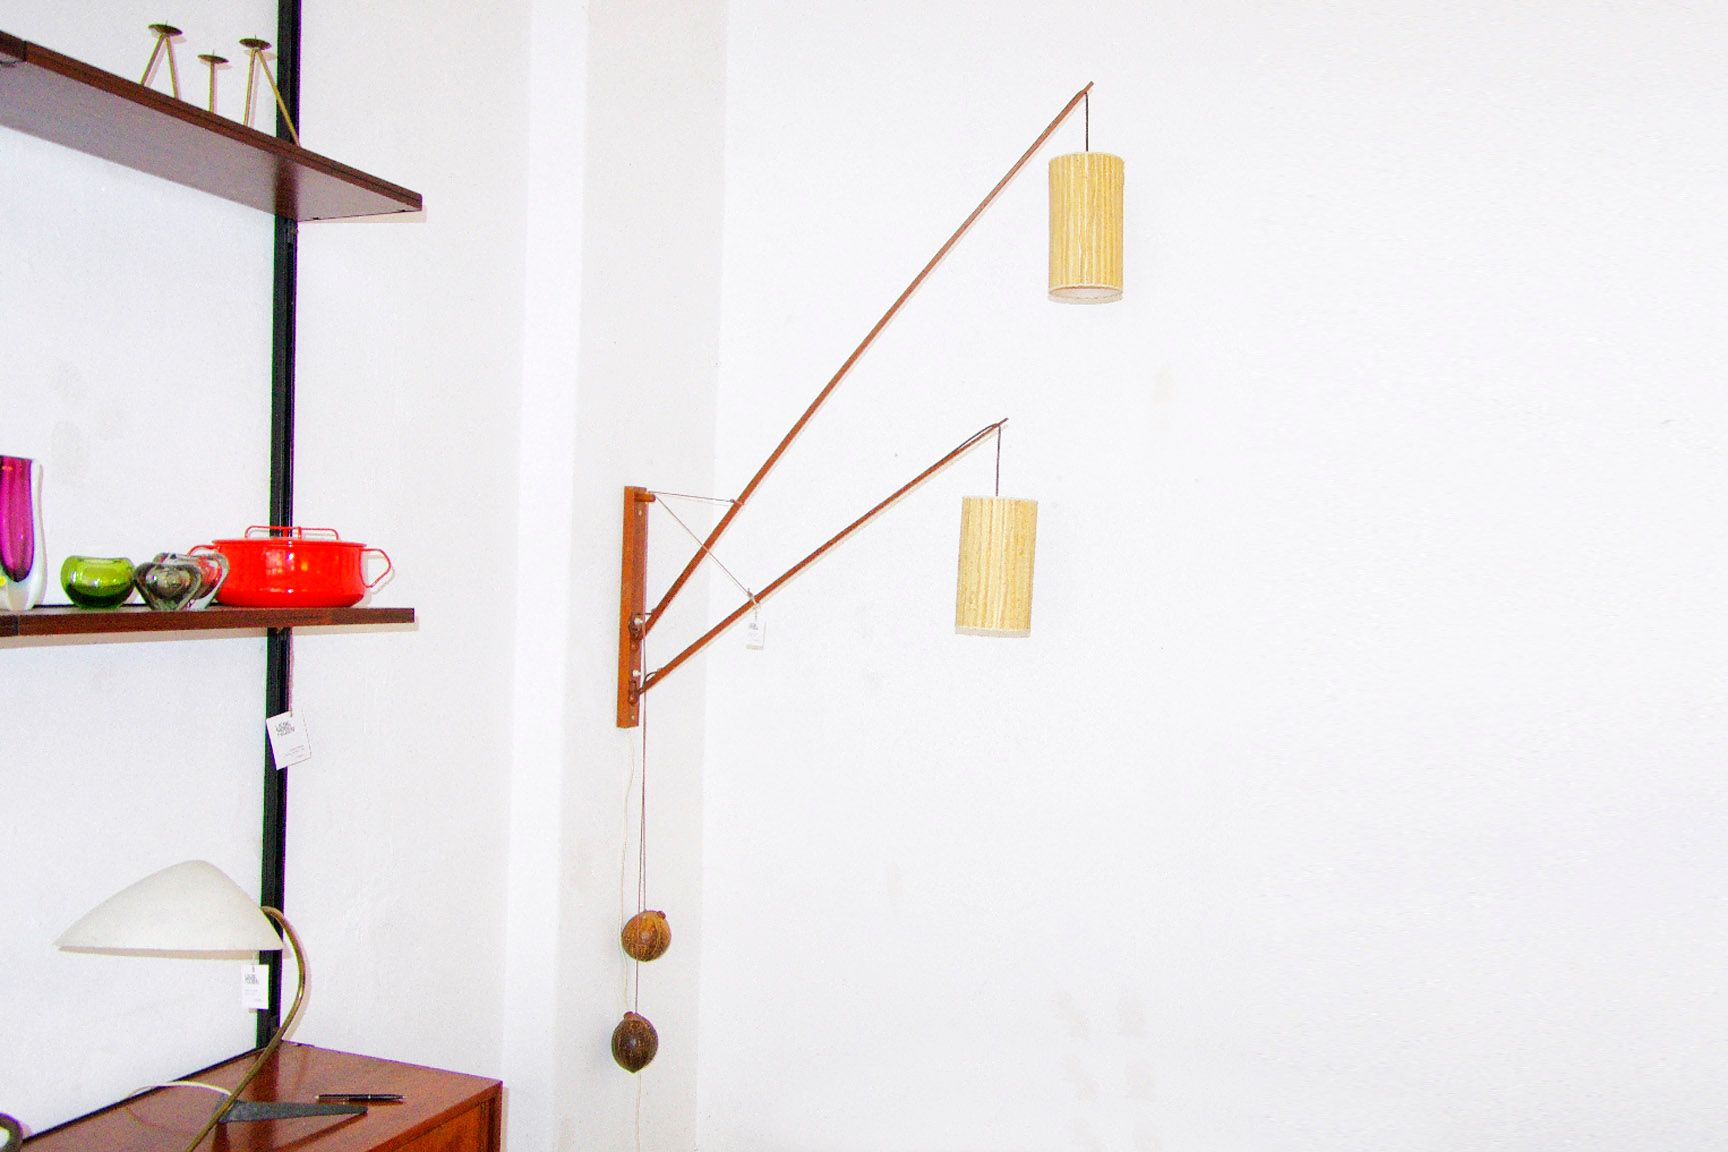 teakholz wandlampe von rupprecht skrip f r skrip leuchten. Black Bedroom Furniture Sets. Home Design Ideas